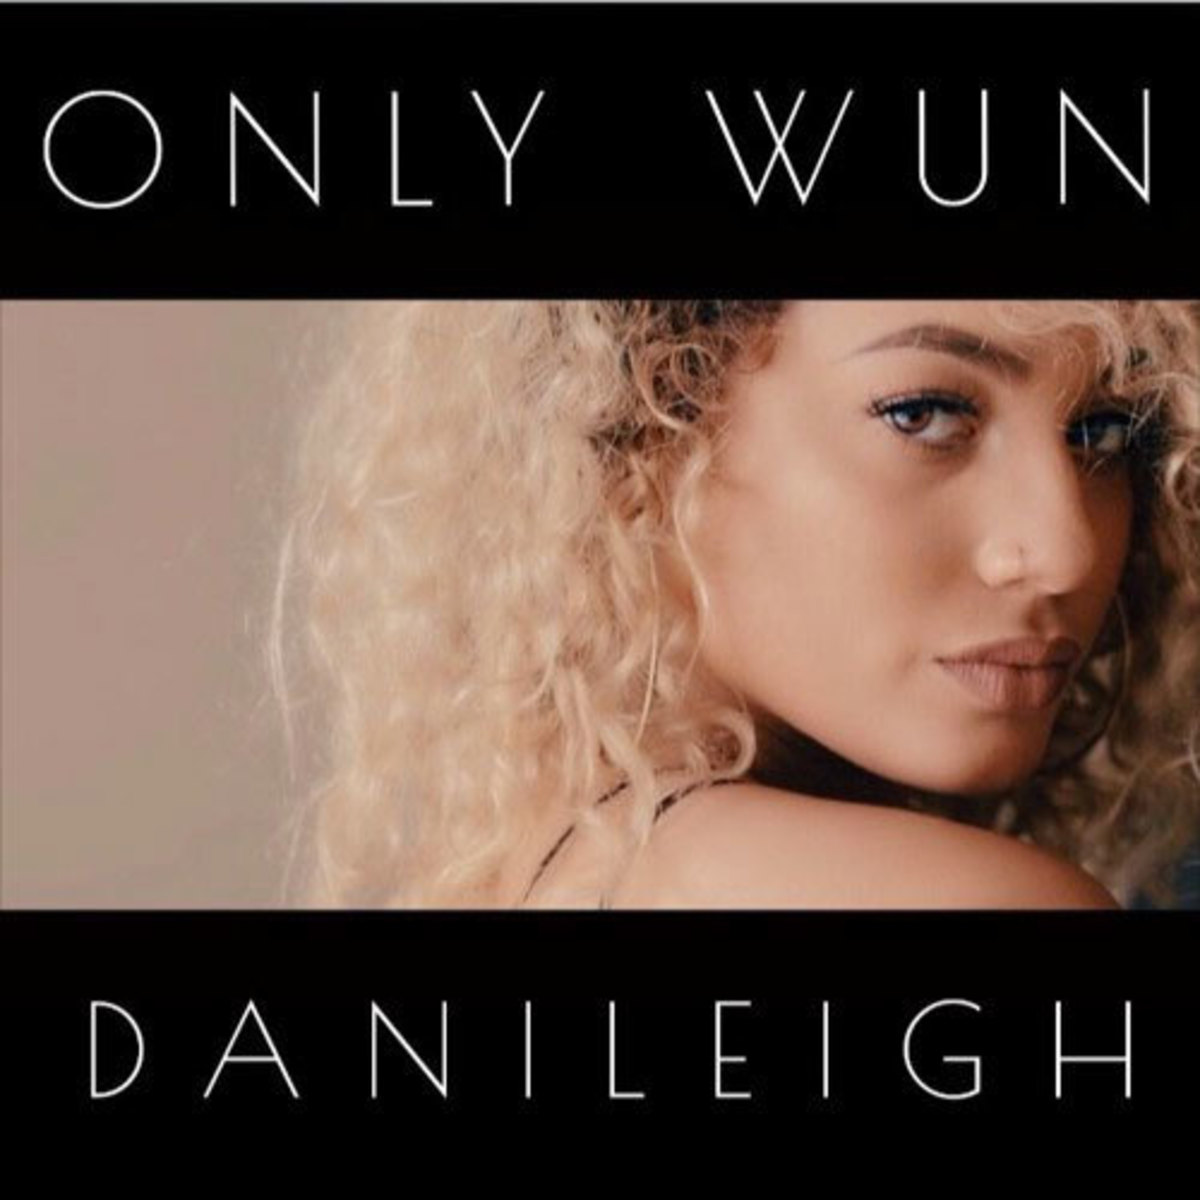 danileigh-only-wun.jpg